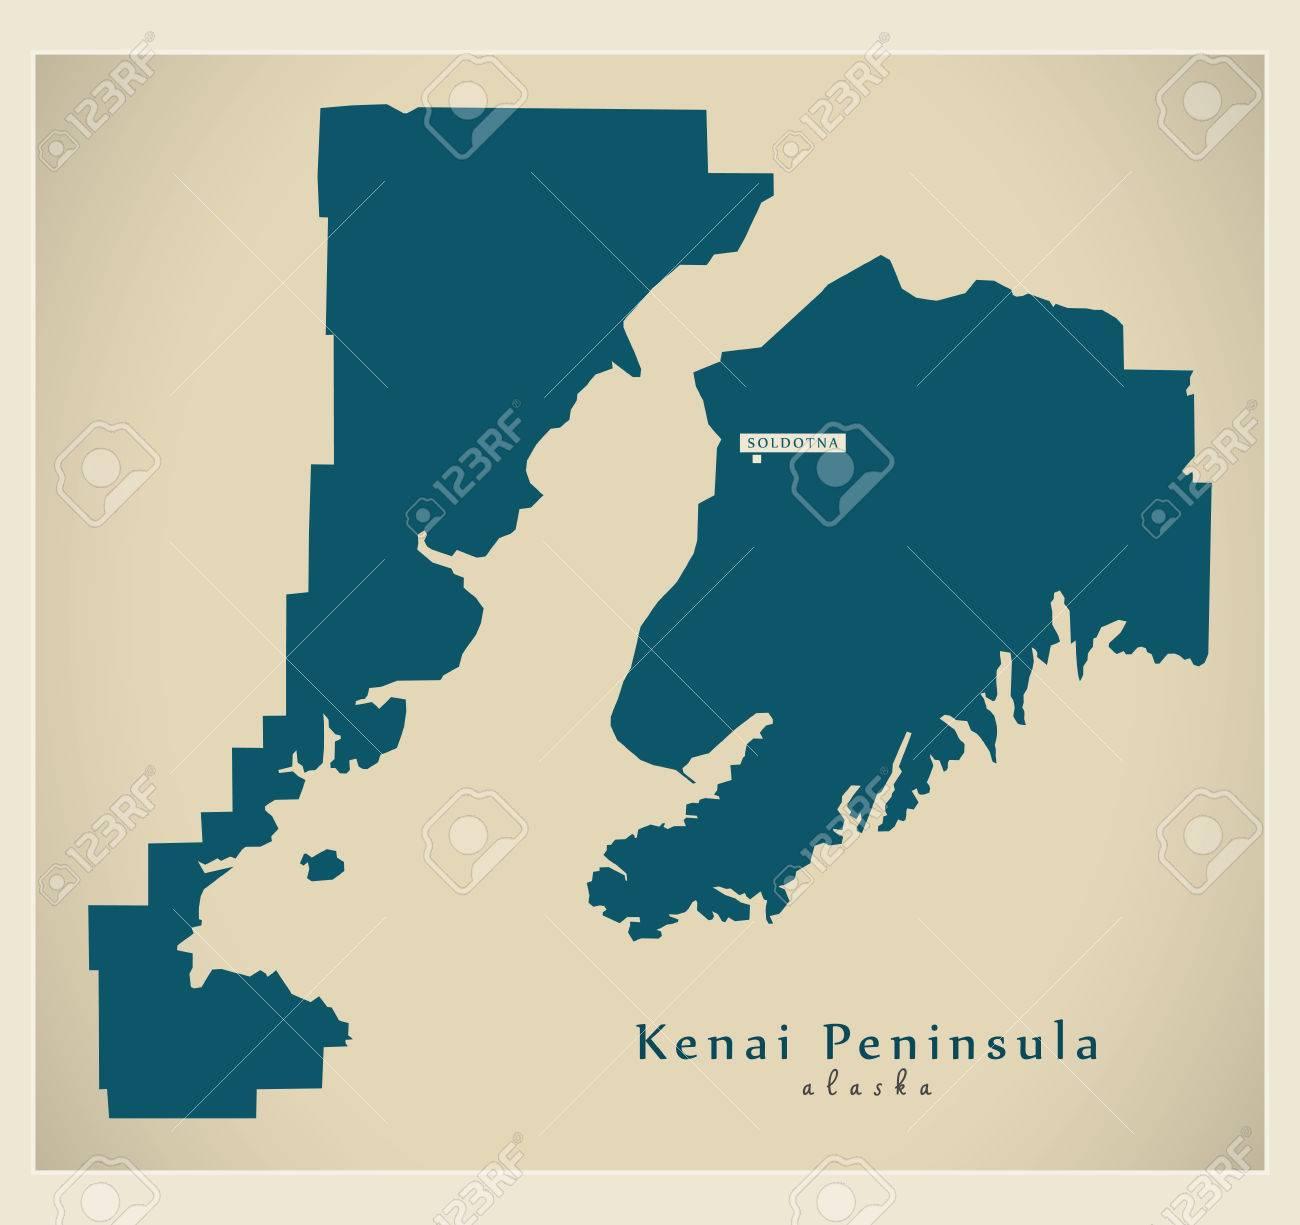 Modern Map - Kenai Peninsula Alaska county USA illustration on moose pass map, kenai peninsula borough, cook inlet map, alaska north slope, idaho map, nanwalek map, bethel map, olympic peninsula map, tyonek ak map, kenai fjords national park, virginia peninsula map, michigan's upper peninsula map, inside passage, wrangell mountains, washington peninsula map, resurrection bay, alaska peninsula, alaska map, california peninsula map, chitina river map, prince william sound, chugach mountains, matanuska-susitna valley, palmer peninsula map, cook inlet, kachemak bay map, soldotna map, russian river, yakima peninsula map, alexander archipelago, saint elias mountains, anchorage map, katmai national park and preserve map, seward peninsula, matanuska valley map,